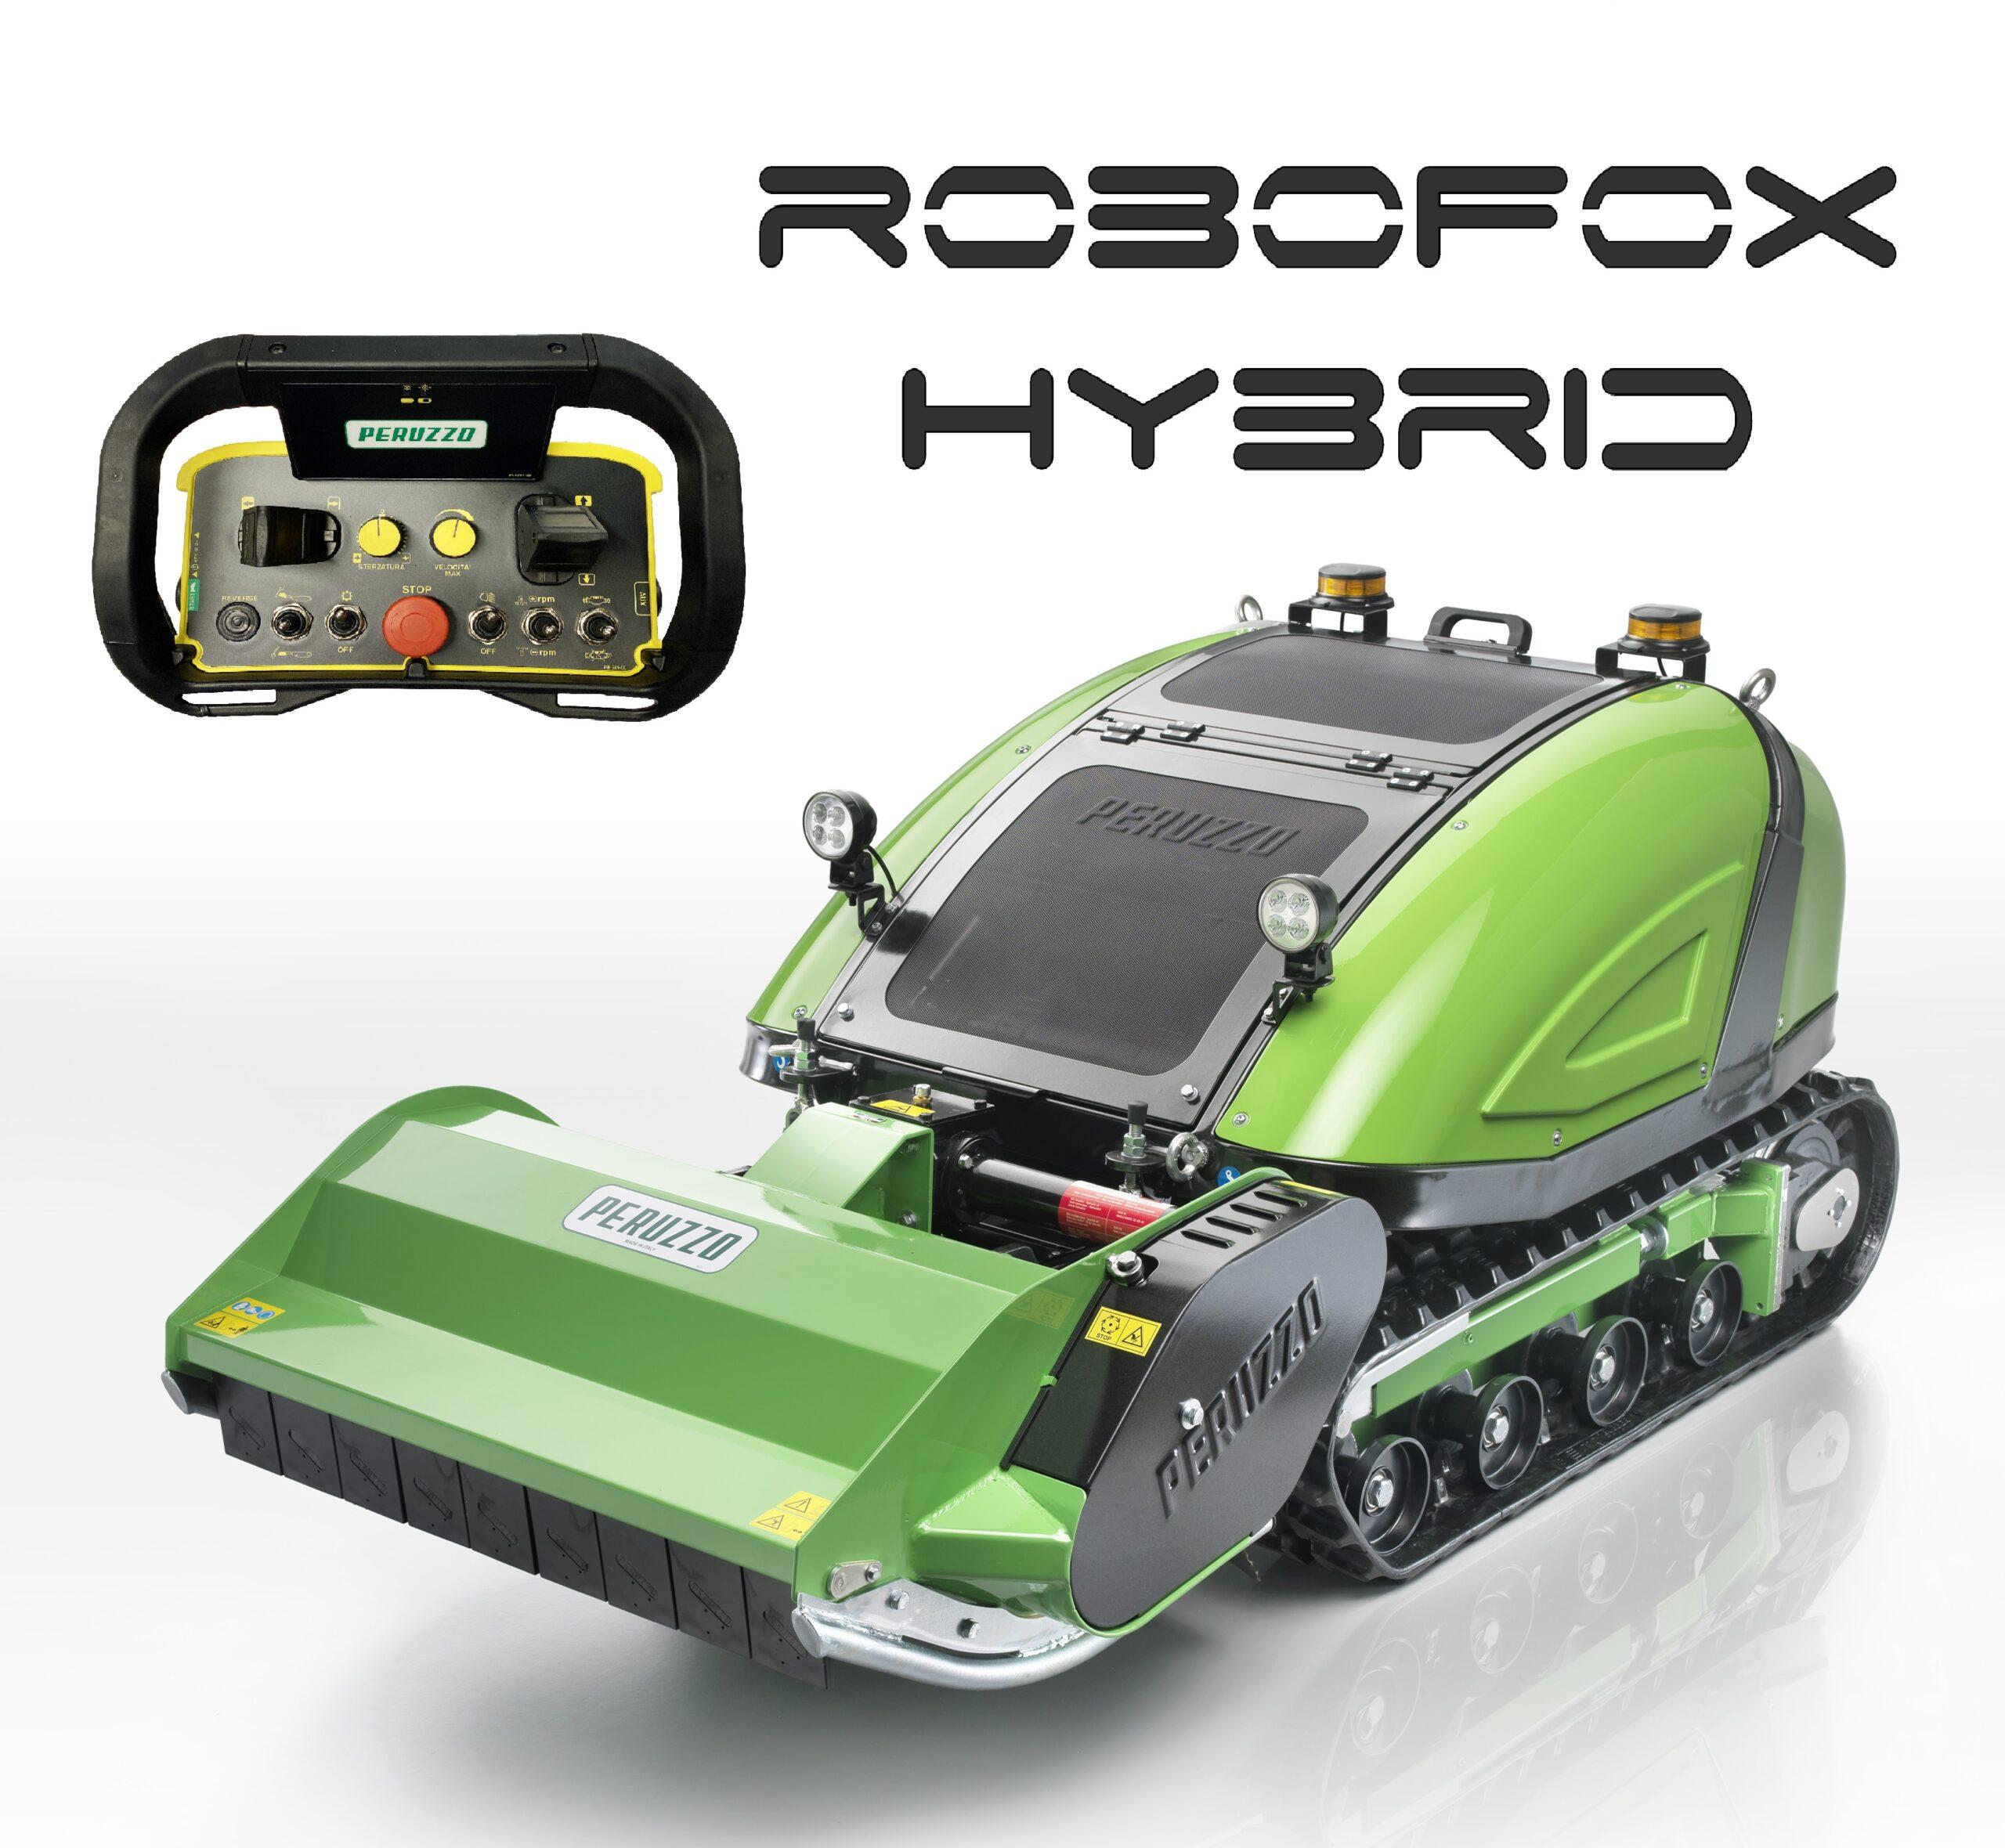 , Trinciaerba semovente radiocomandata ROBOFOX HYBRID, Peruzzo